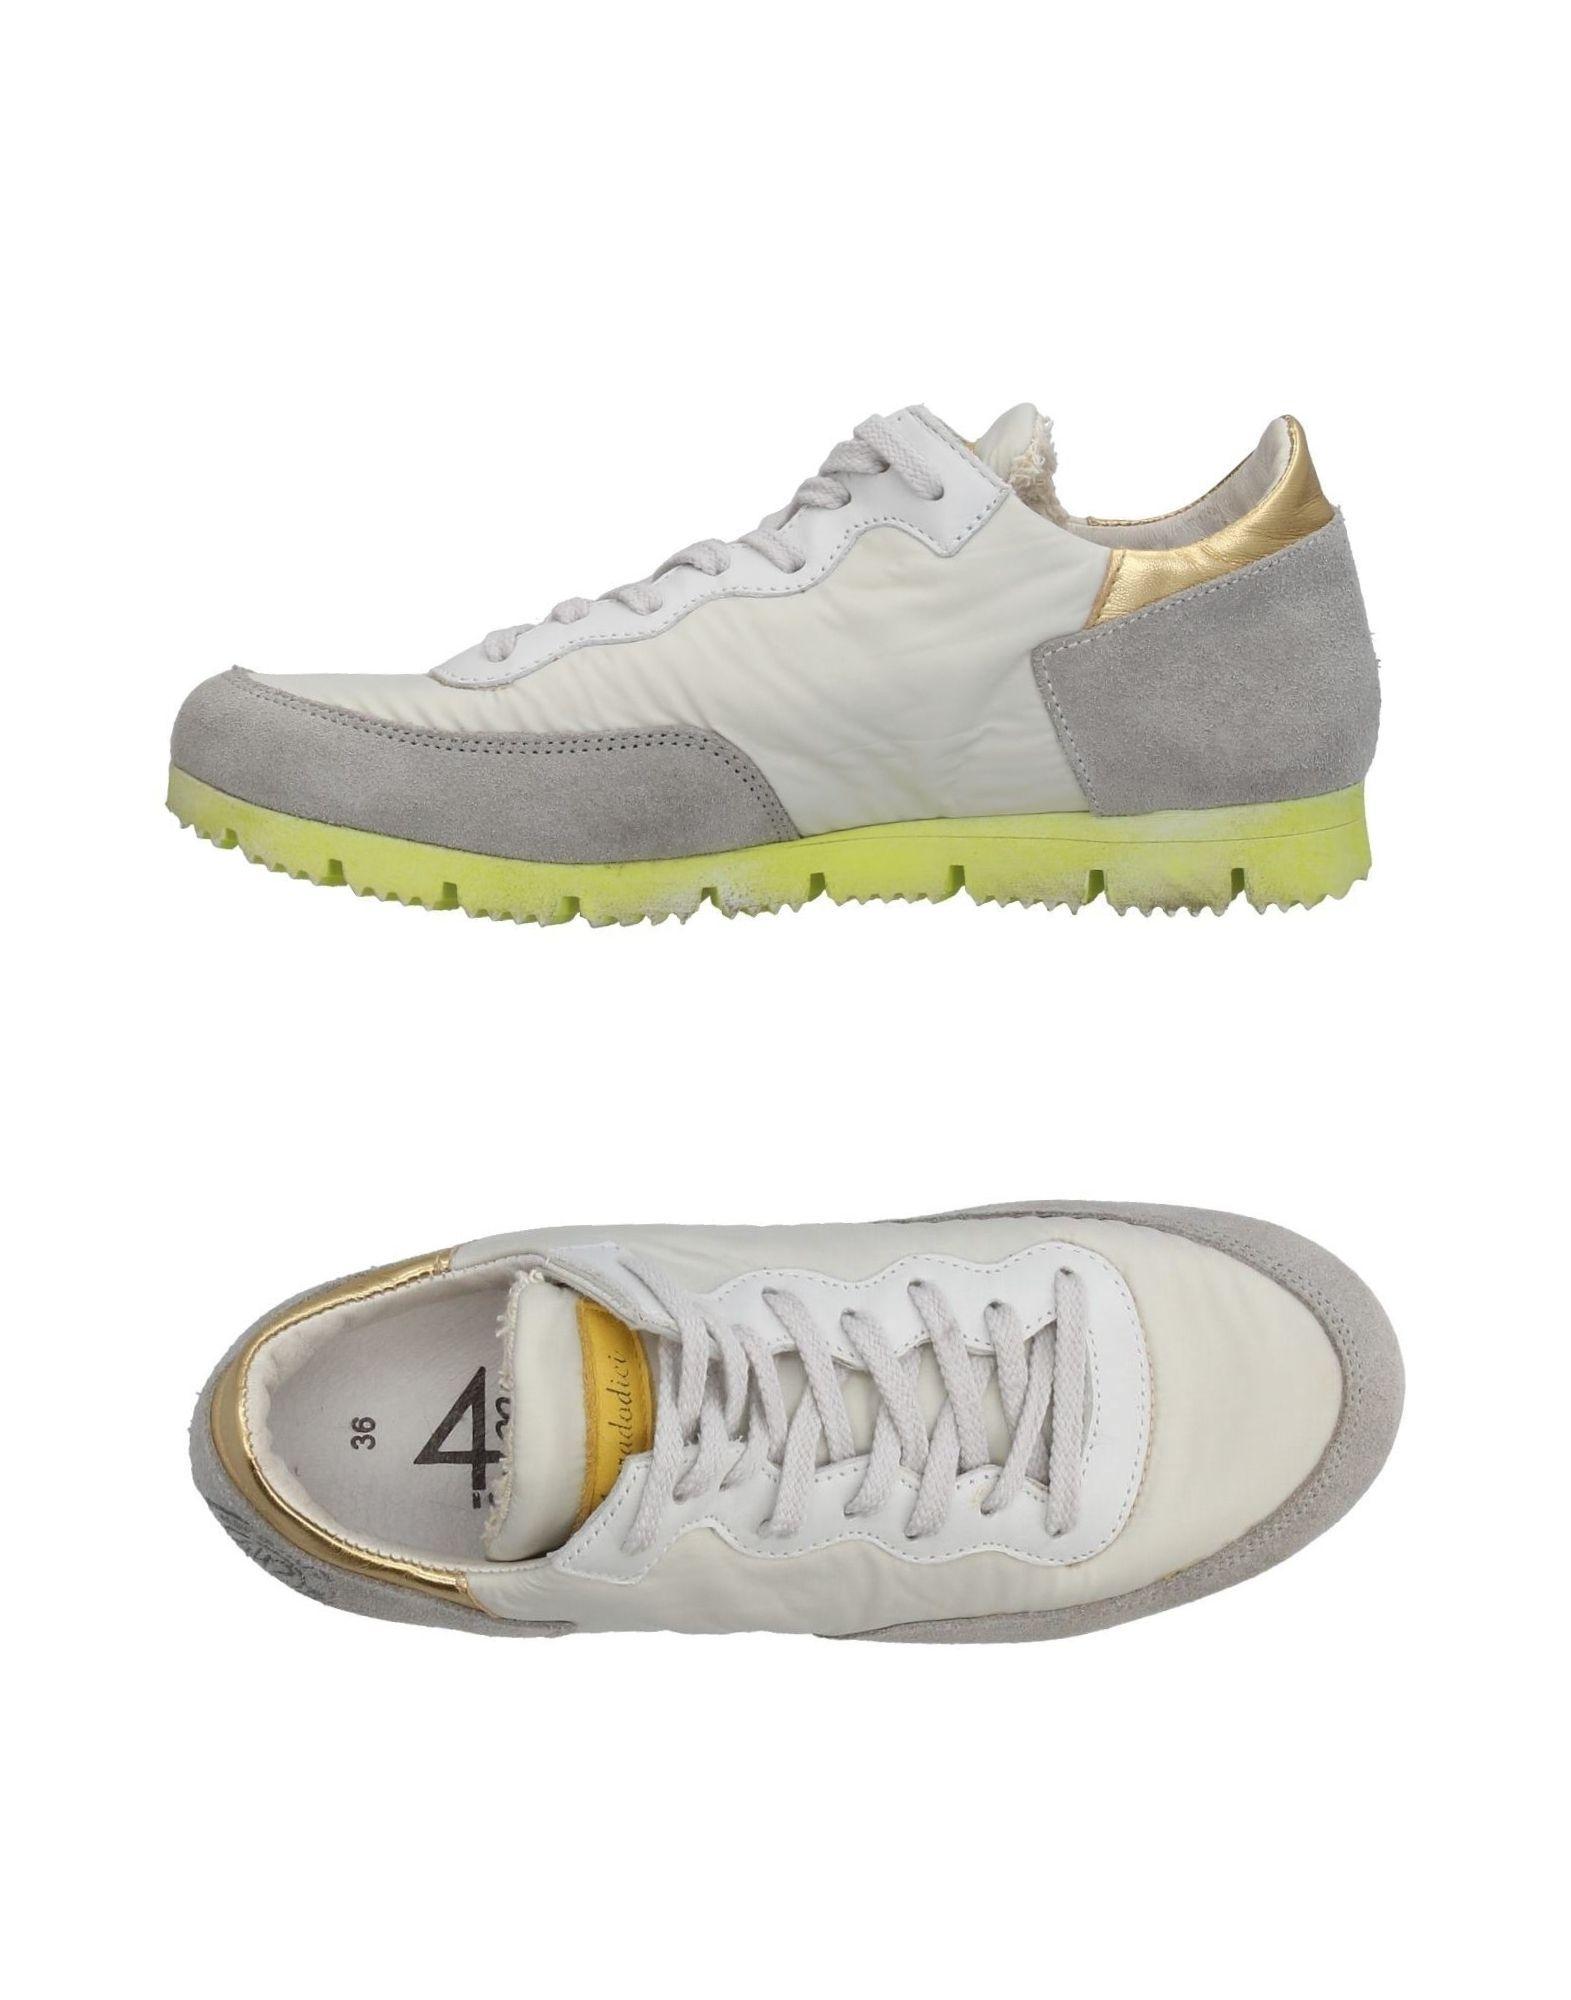 QUATTROBARRADODICI Damen Low Sneakers & Tennisschuhe Farbe Hellgrau Größe 5 jetztbilligerkaufen